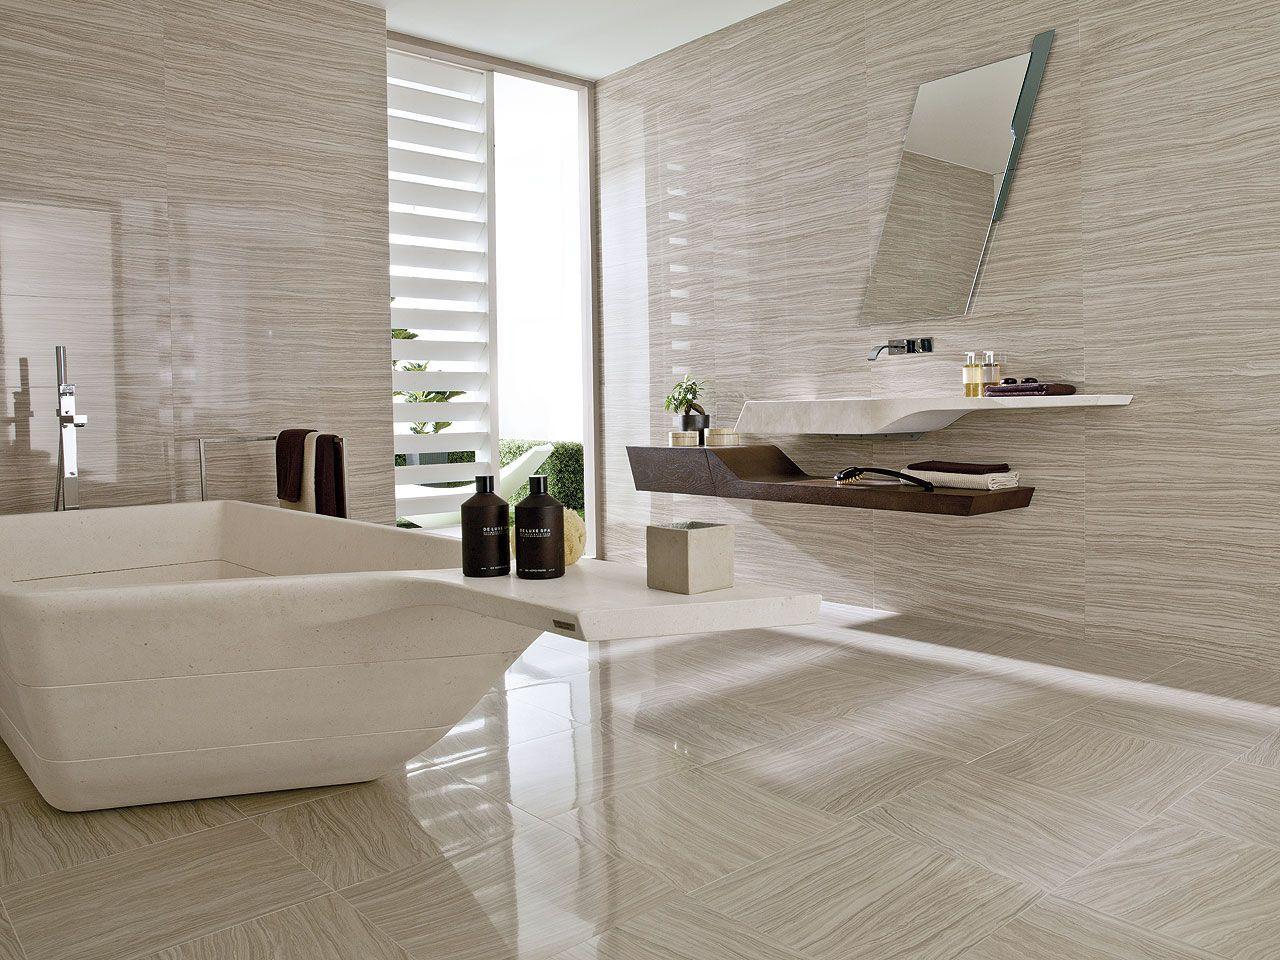 porcelanosa bathroom tile - Google Search | Bathroom Ideas ...